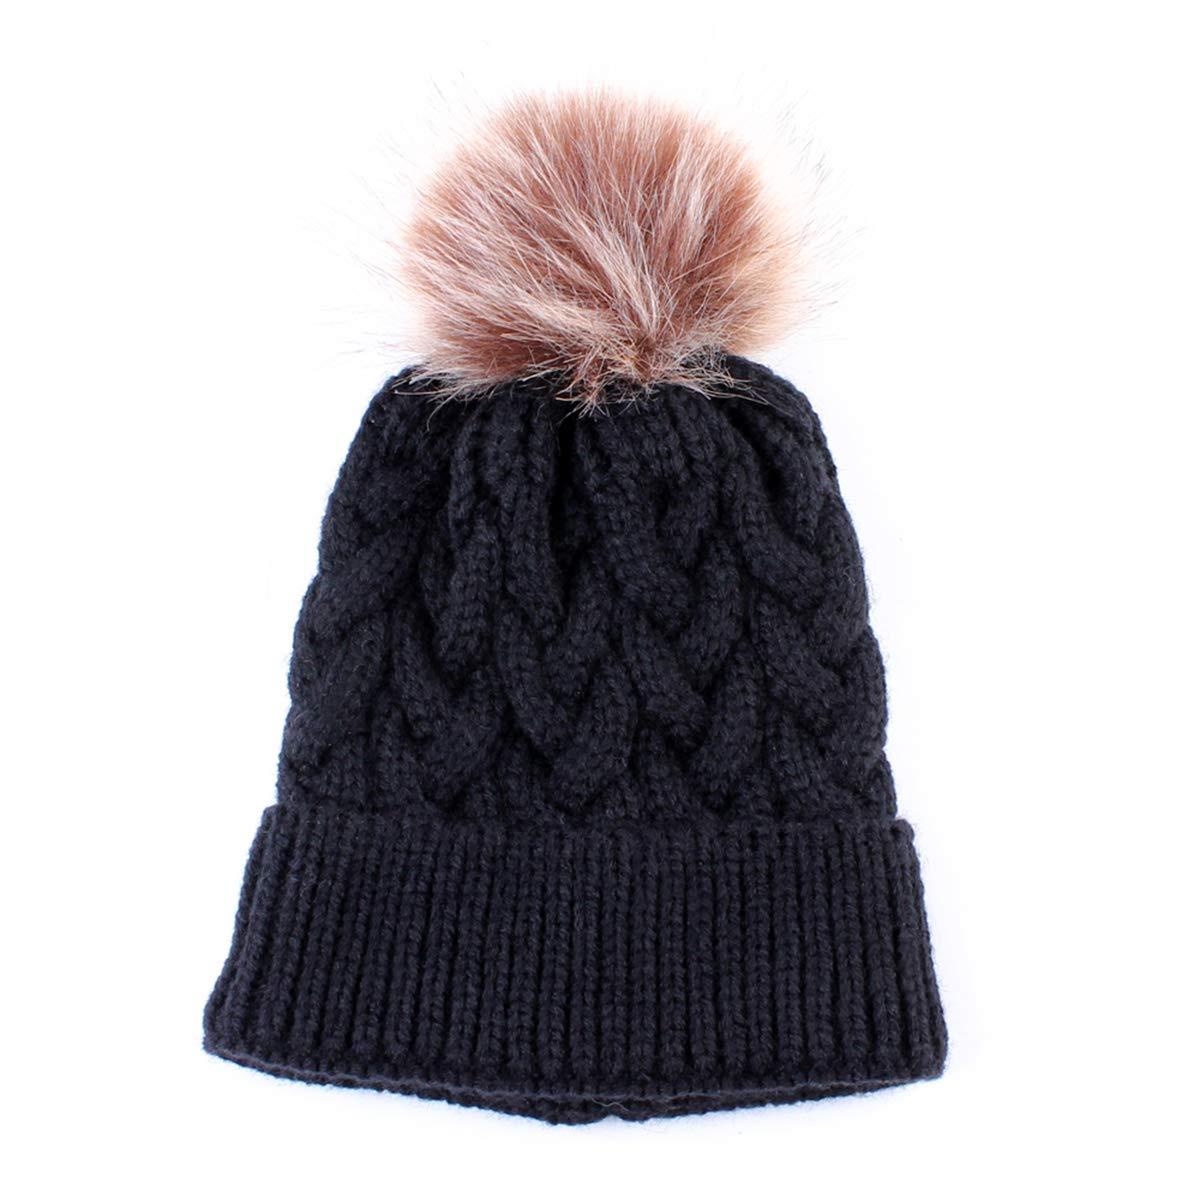 8403f62606f Amazon.com  Yinuoday Baby Knit Hat Cap Winter Warm Wool Infant Toddler Kids Crochet  Beanie Cap New (Black)  Clothing